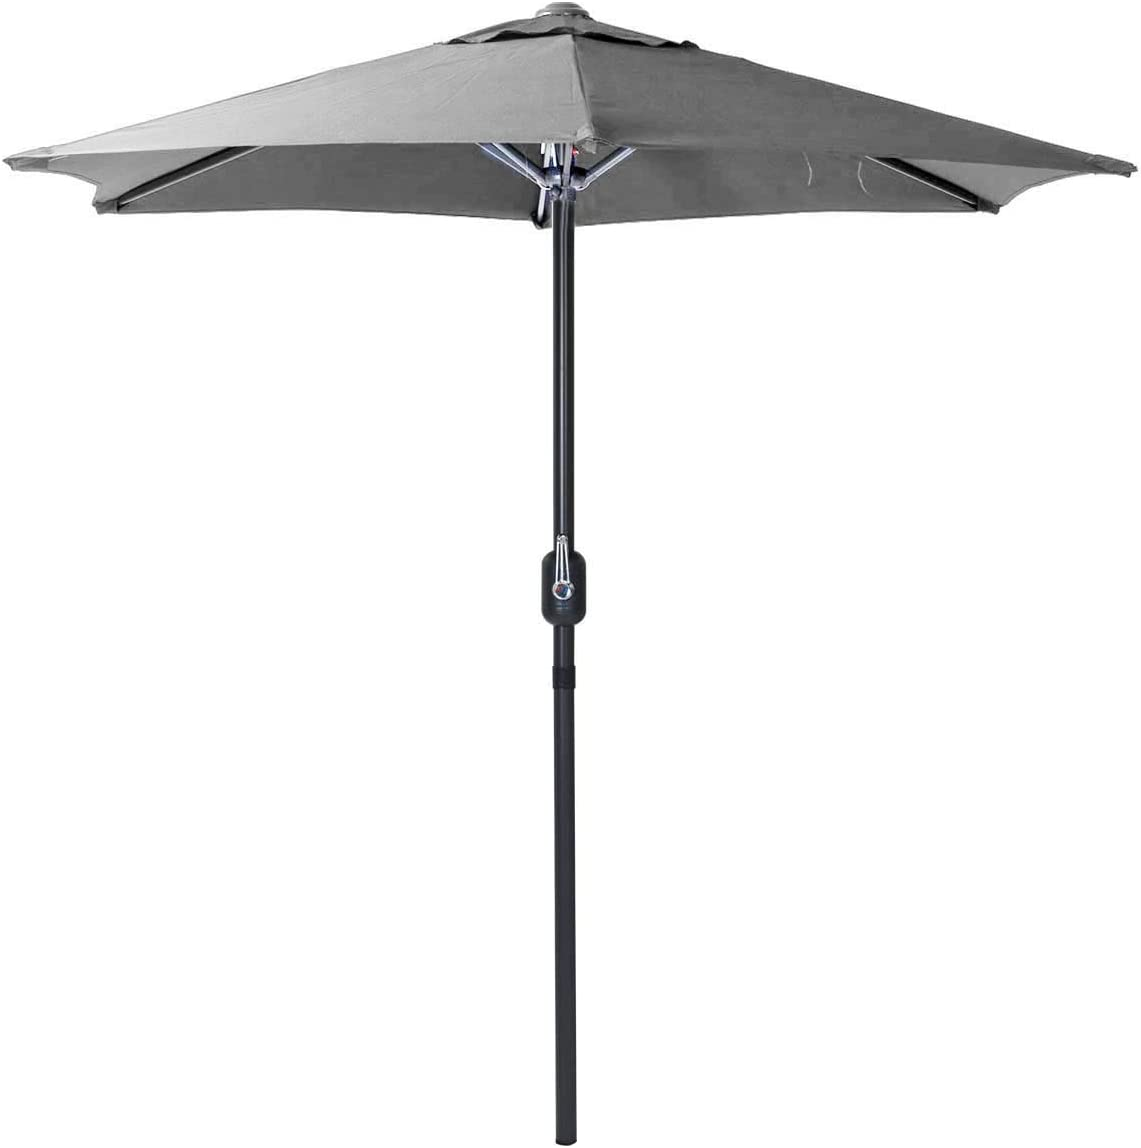 Charles Bentley 2M Garden Patio Market Umbrella Parasol Crank Function Black Showerproof Large Sunshade H220 x L200 x W200 cm